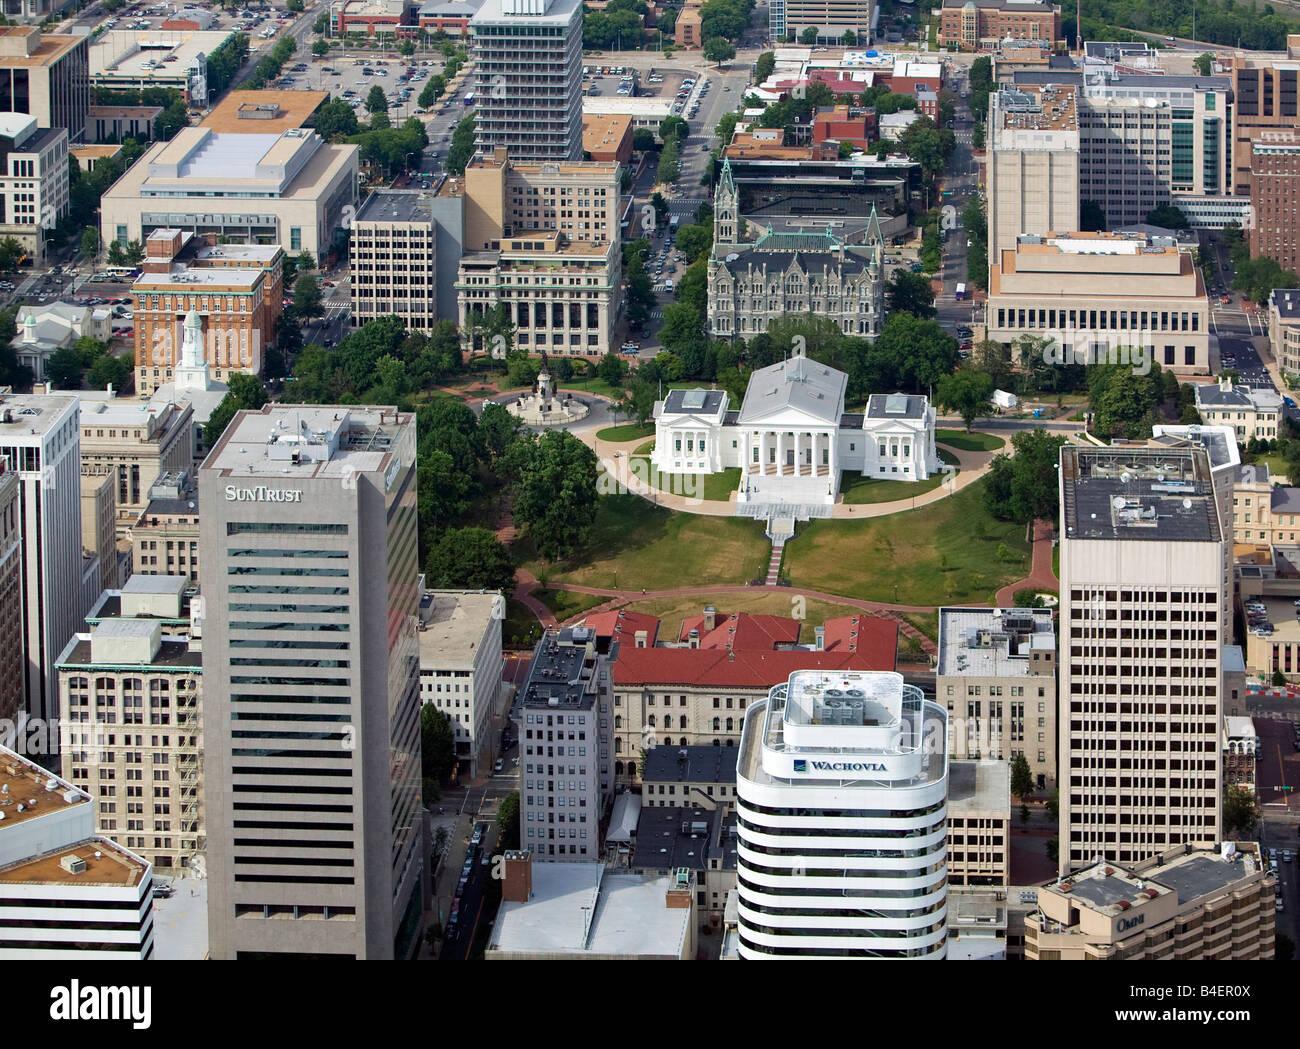 Aerial Above Virginia State Capital Richmond Va Wachovia